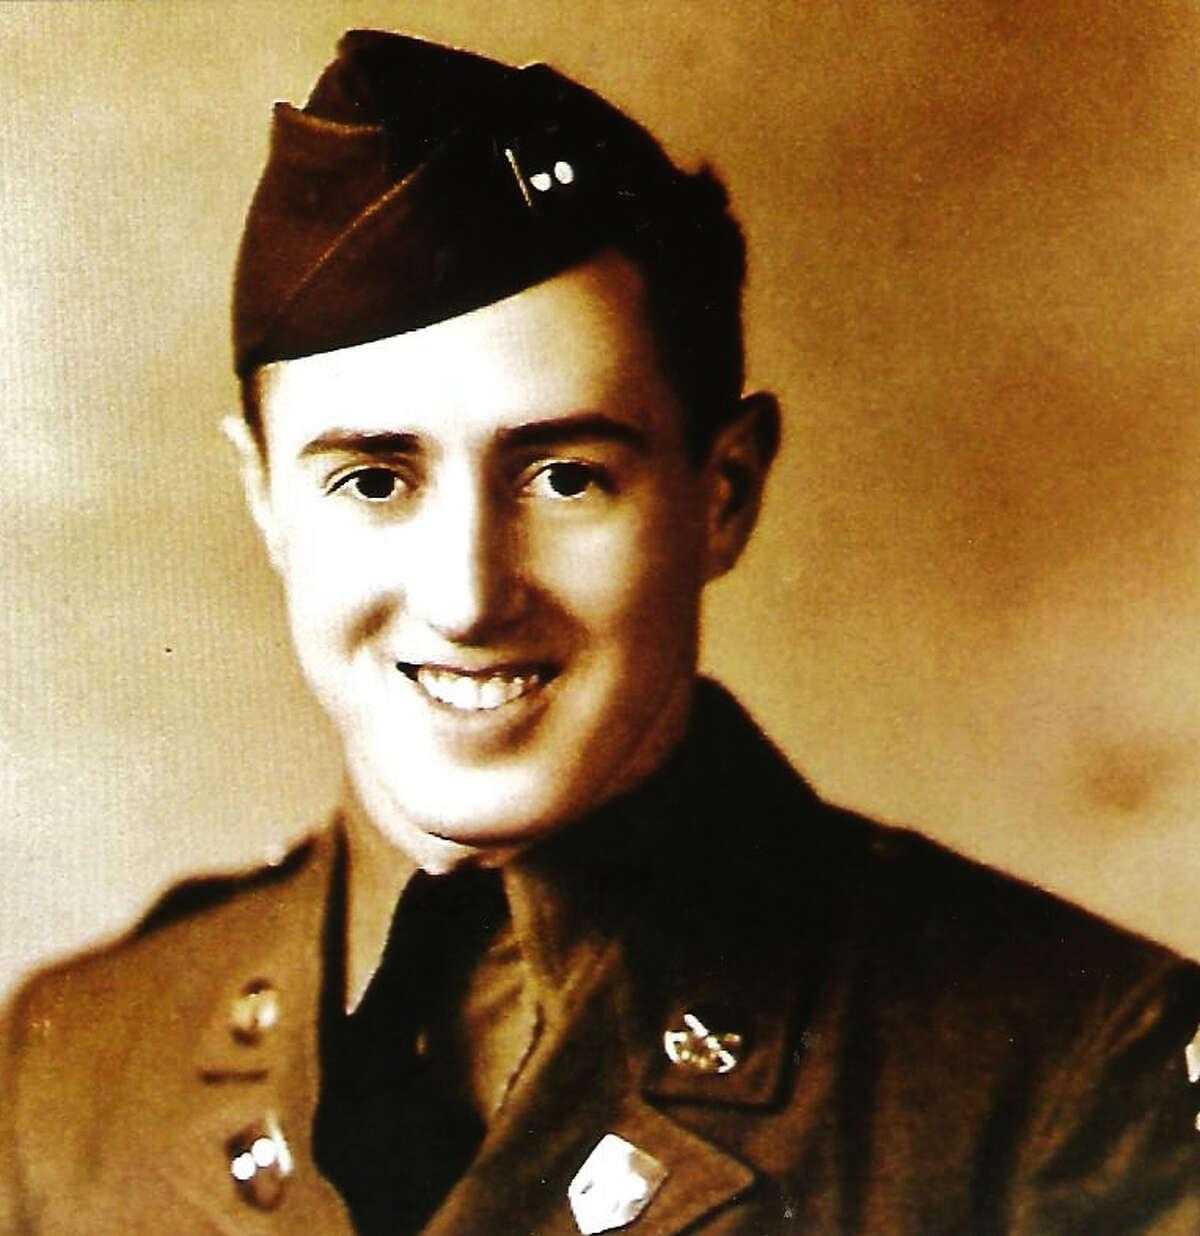 T-5 CPL Donald V. Steinman 1940-1945 U.S. Army